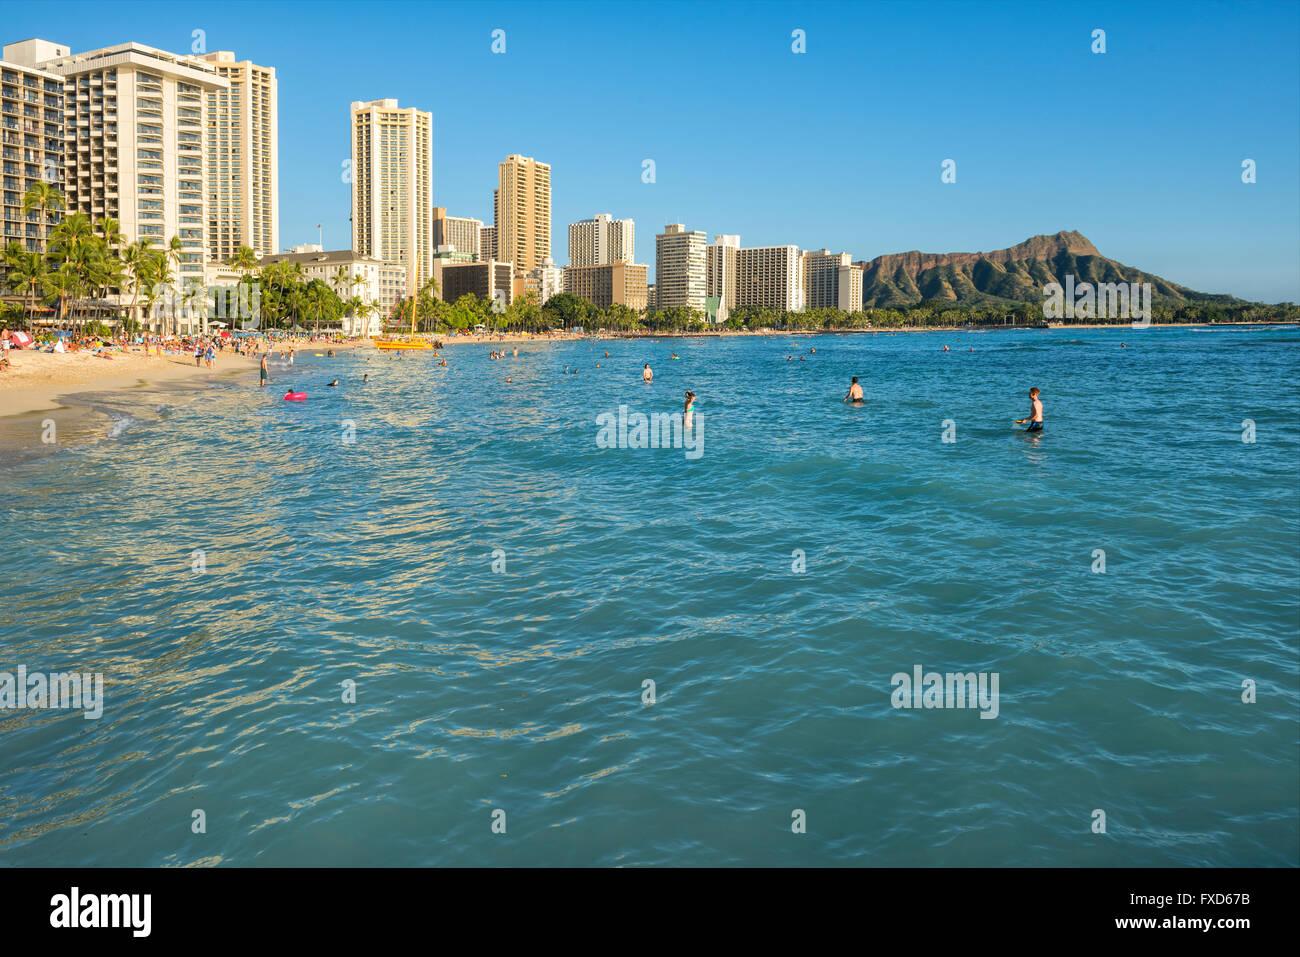 USA, Hawaii, Oahu, Waikiki Beach - Stock Image